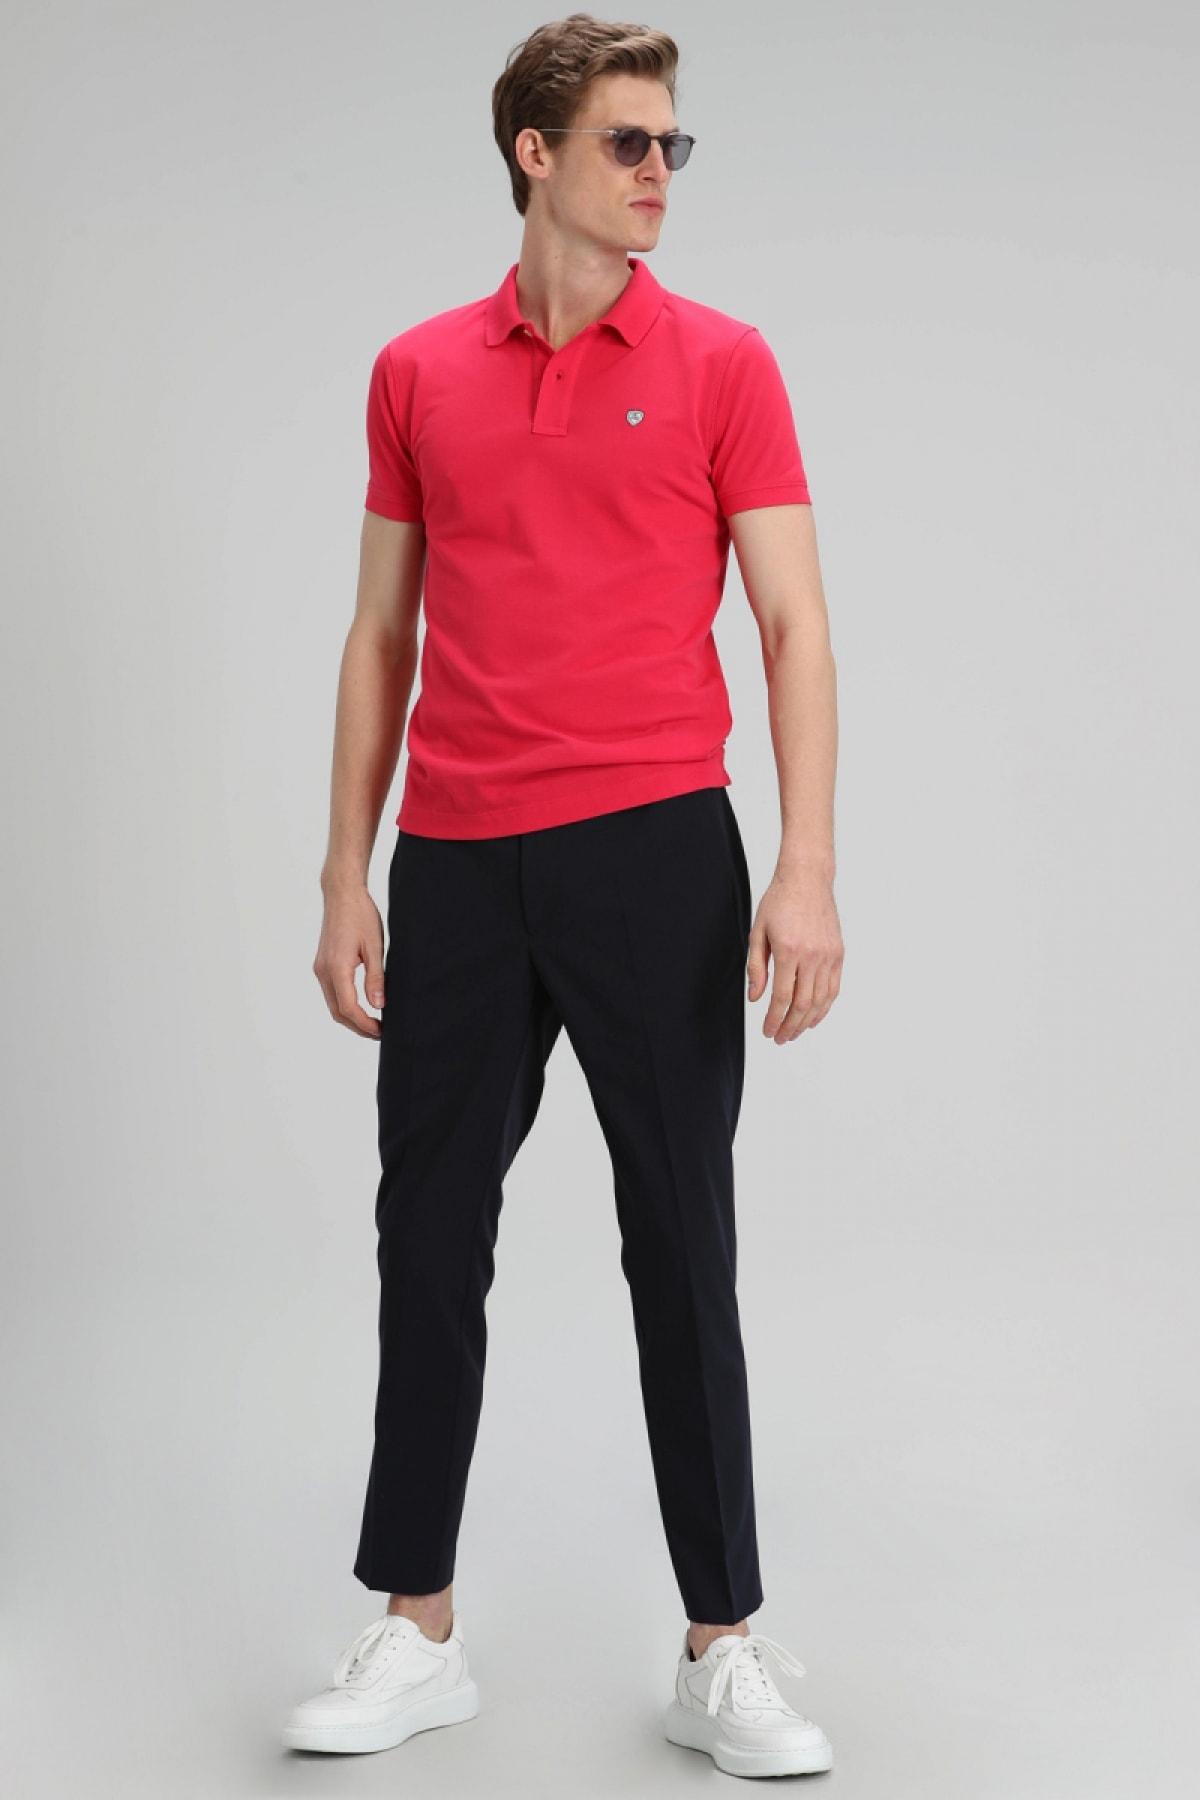 Lufian Laon Spor Polo T- Shirt Fuşya 1